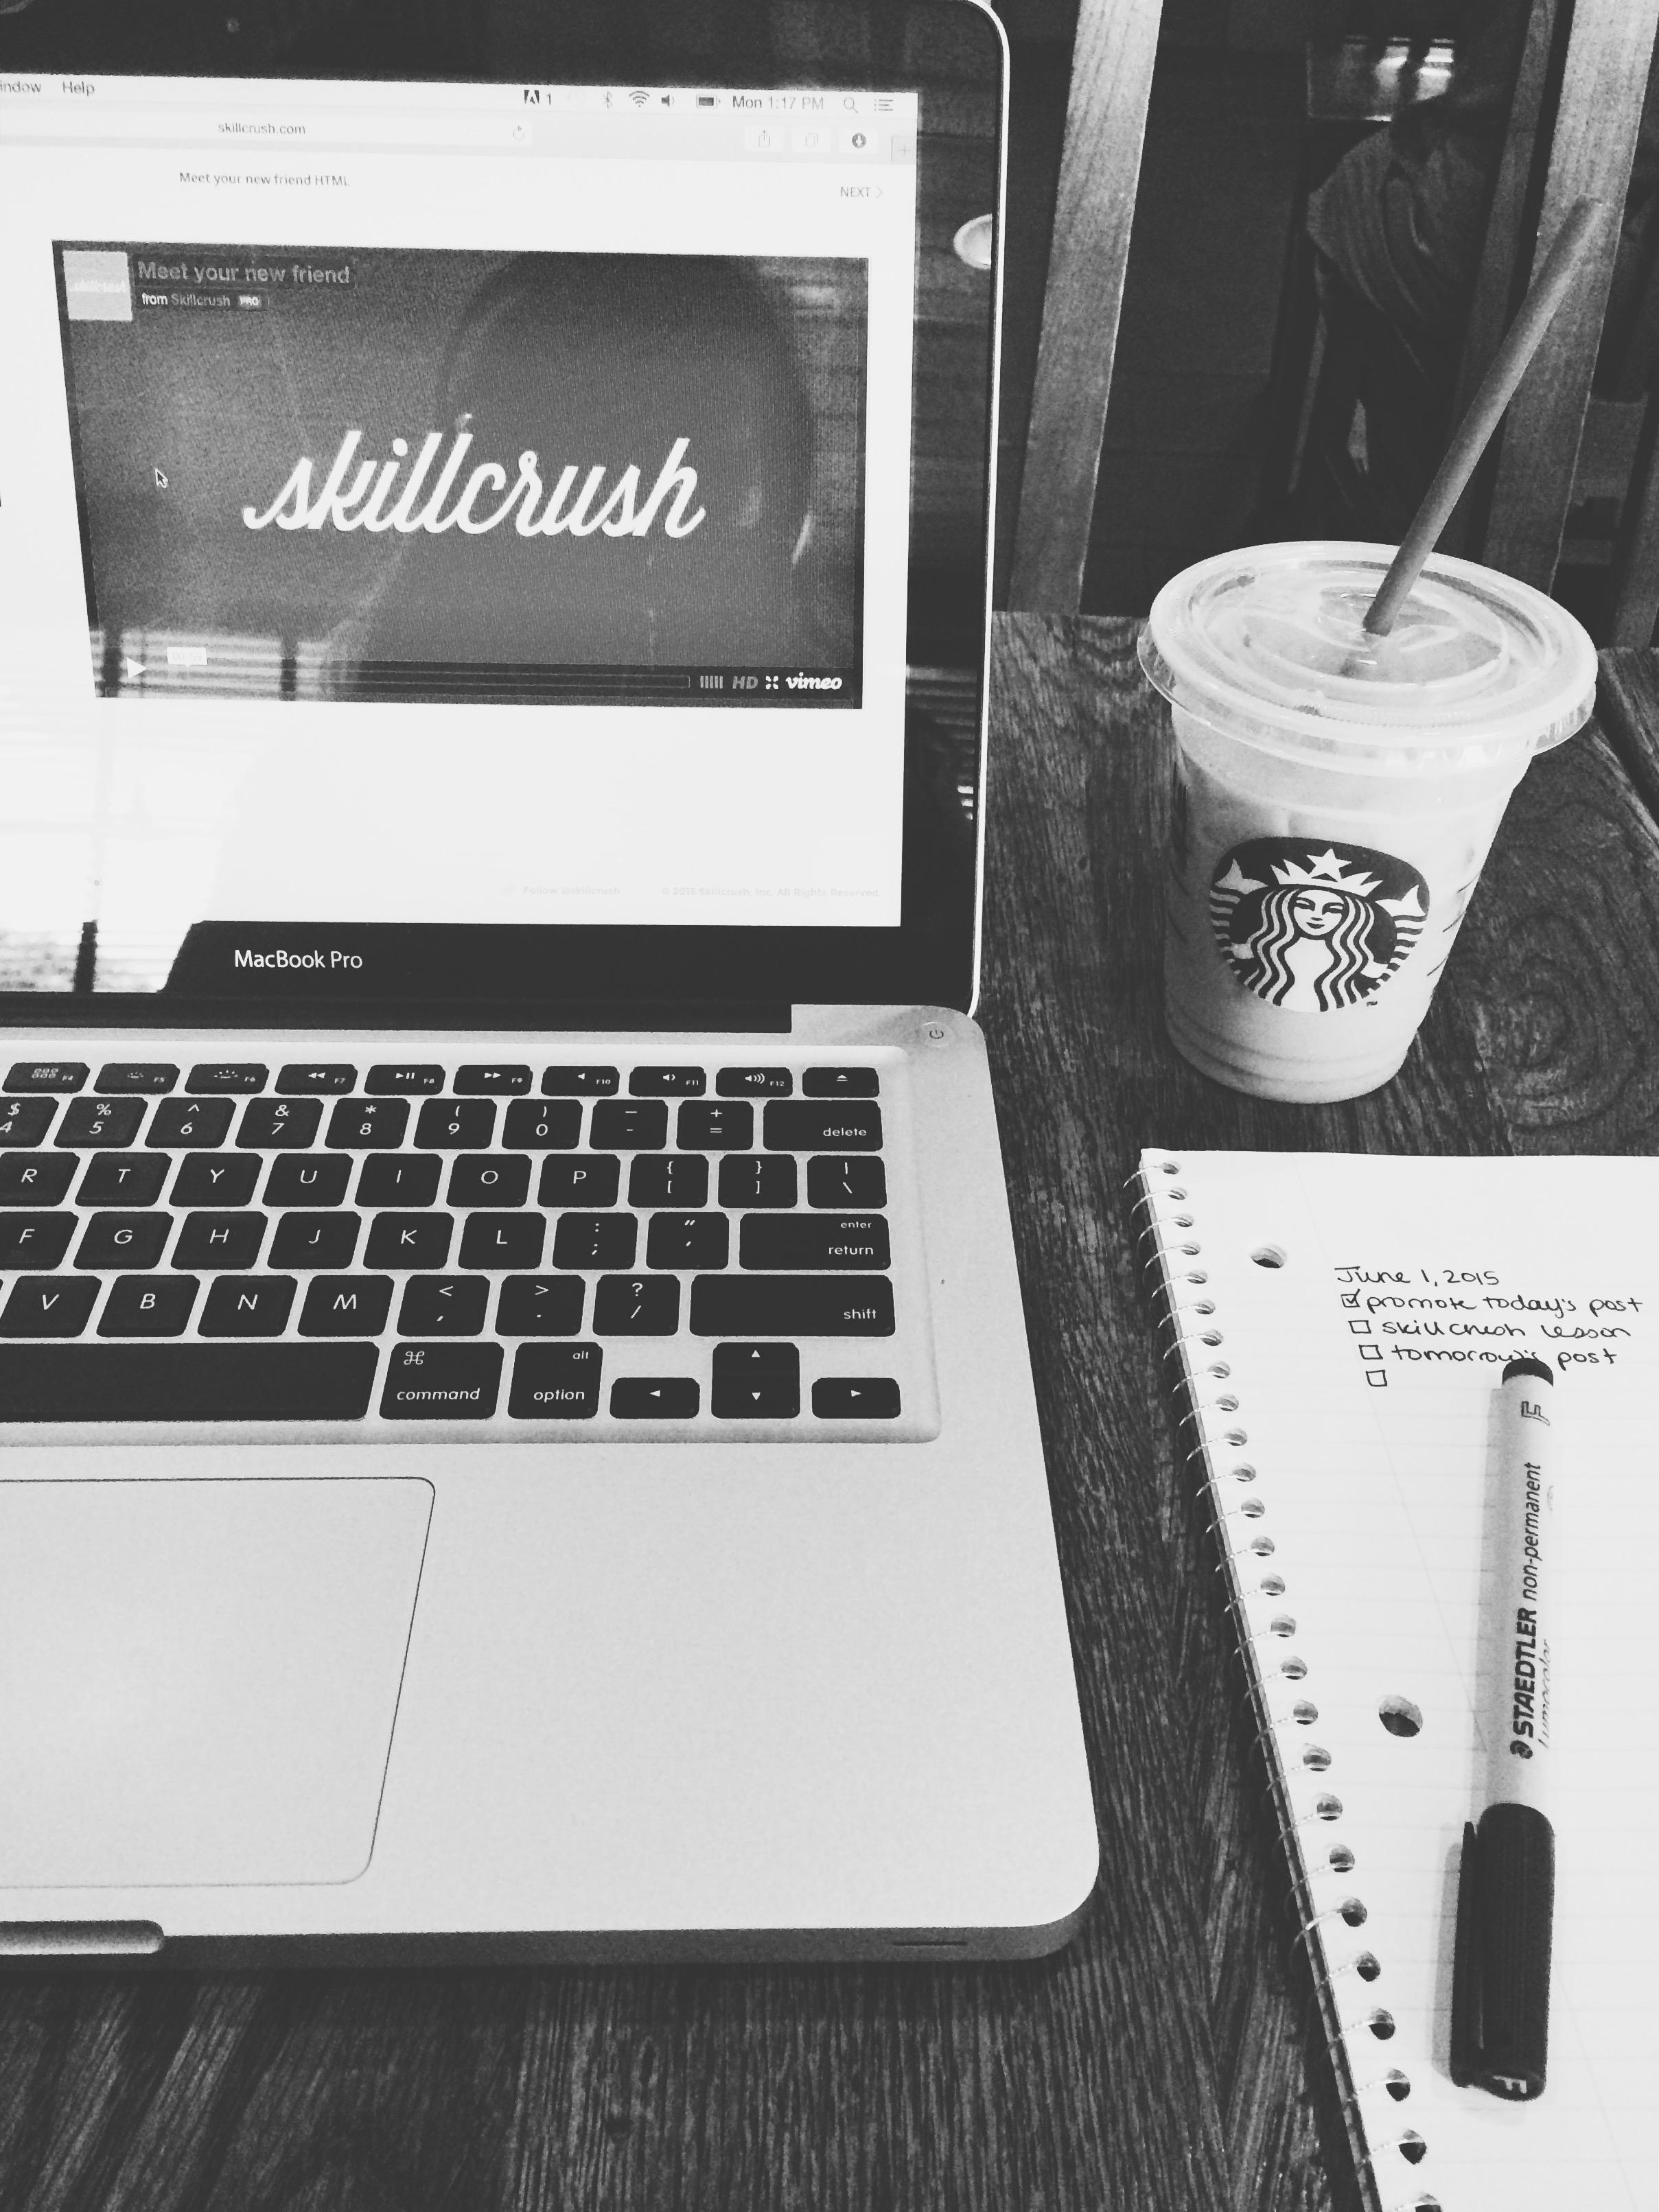 Skillcrush on computer at Starbucks